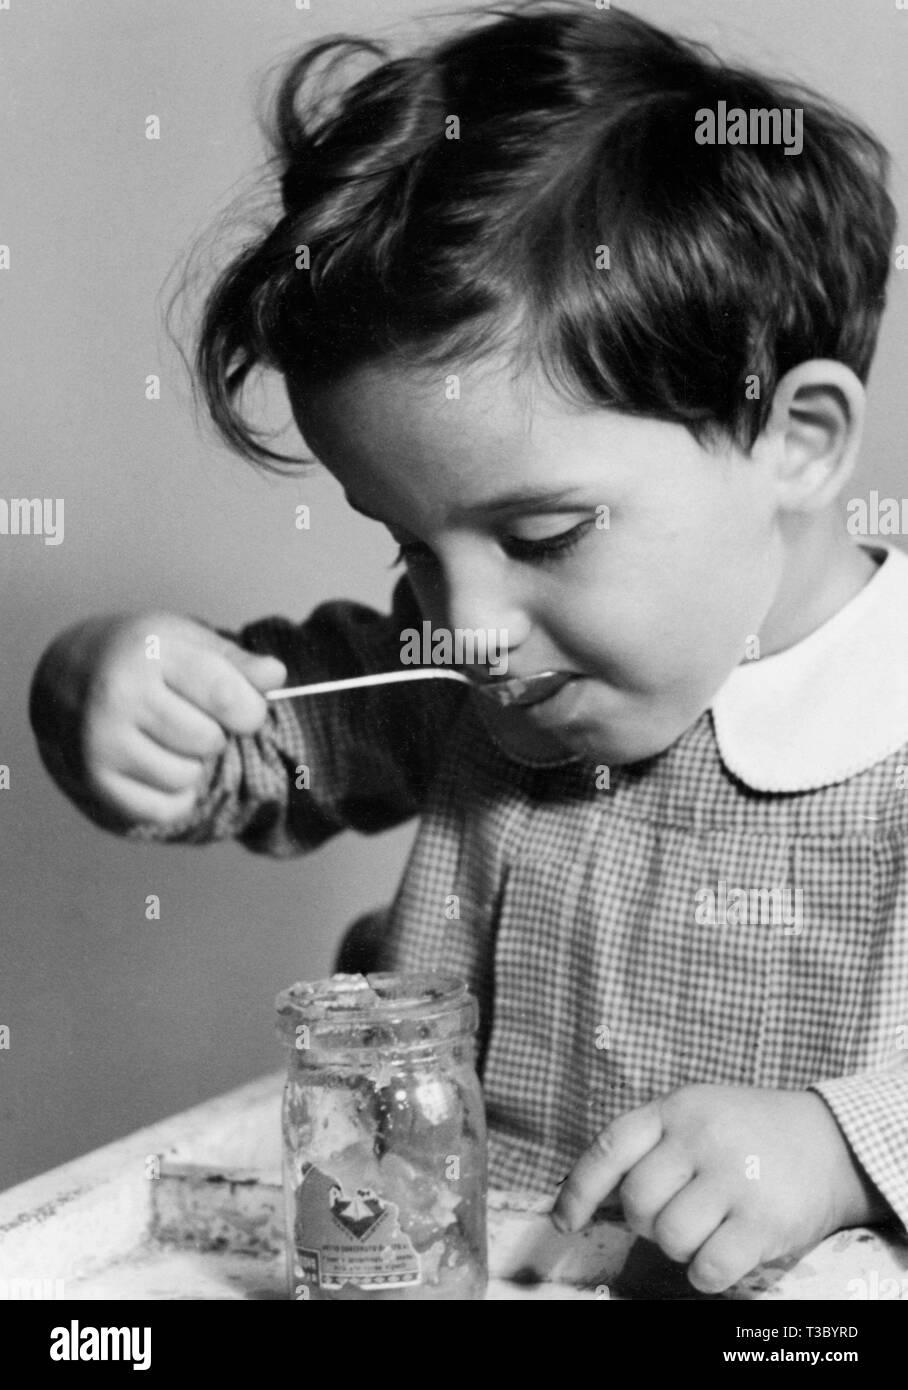 little boy, 1940-1950 - Stock Image